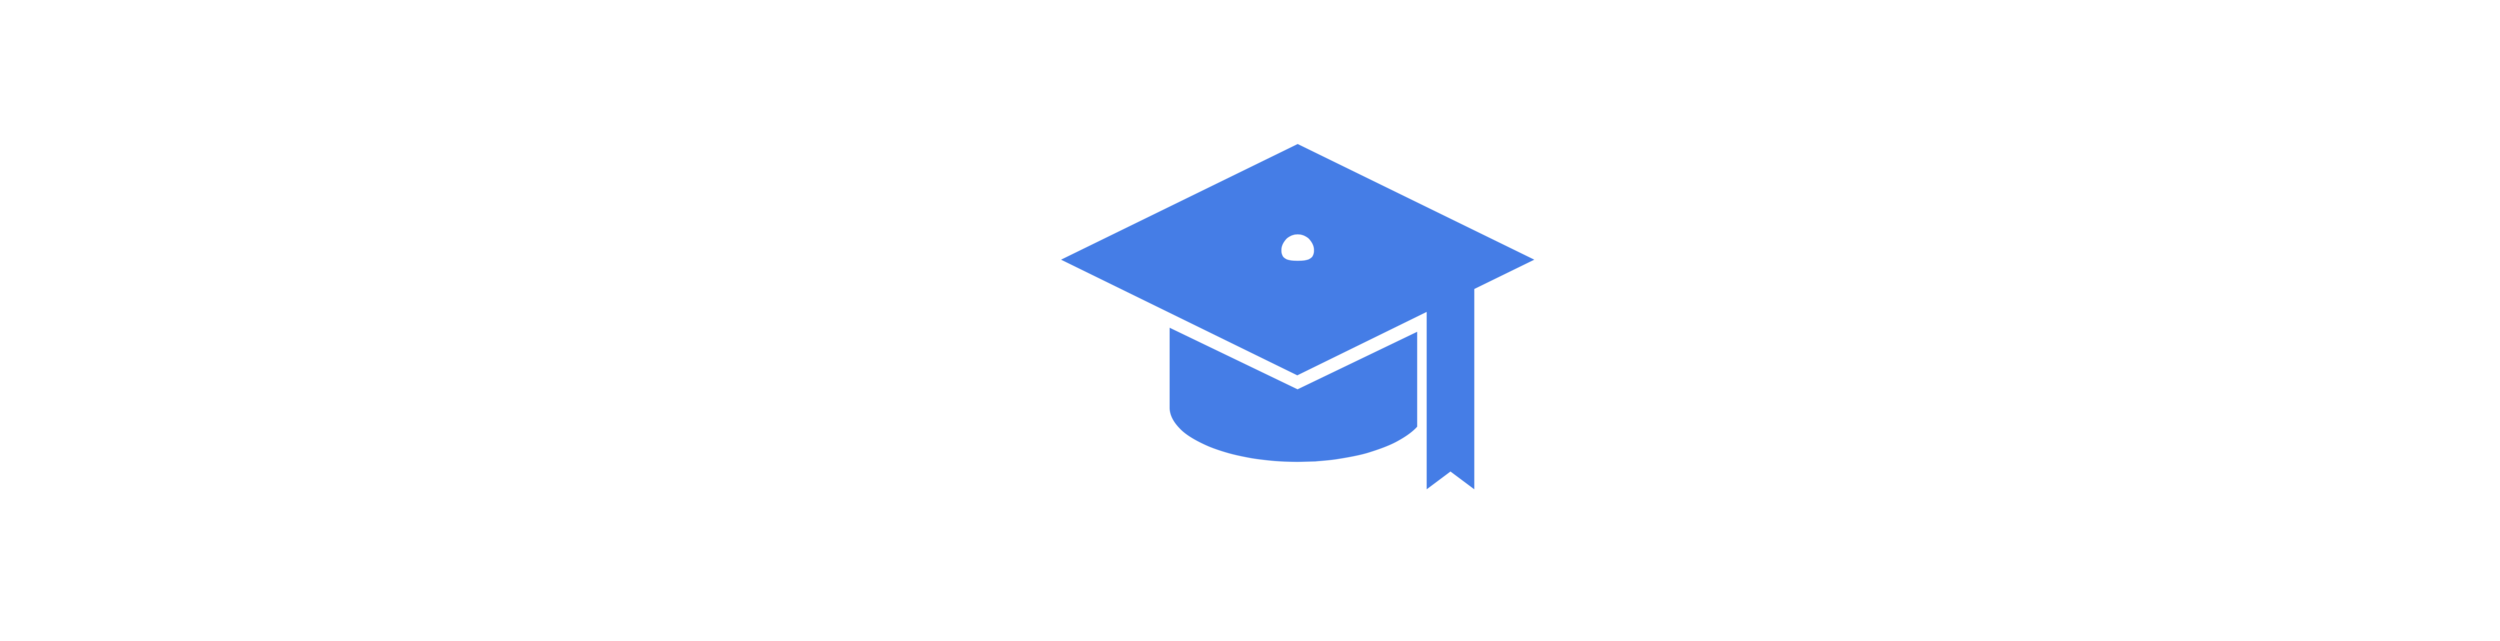 WEBSITE - LEARN LOGO - BLUE 6.png